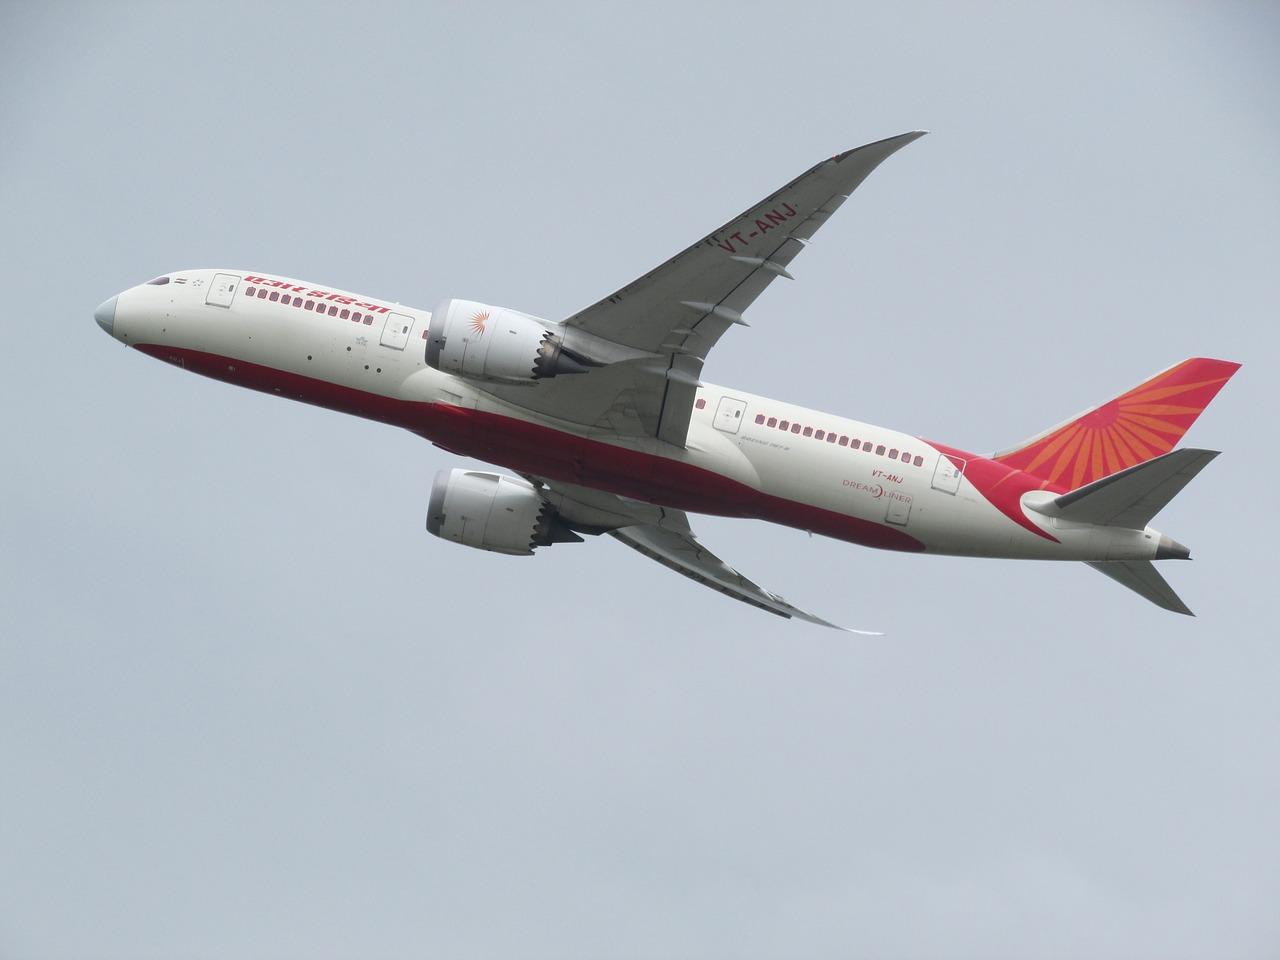 Indian passengers coming through or from Oman, Qatar, UAE and Kuwait | 14-day mandatory quarantine in India | QatarIndians.com